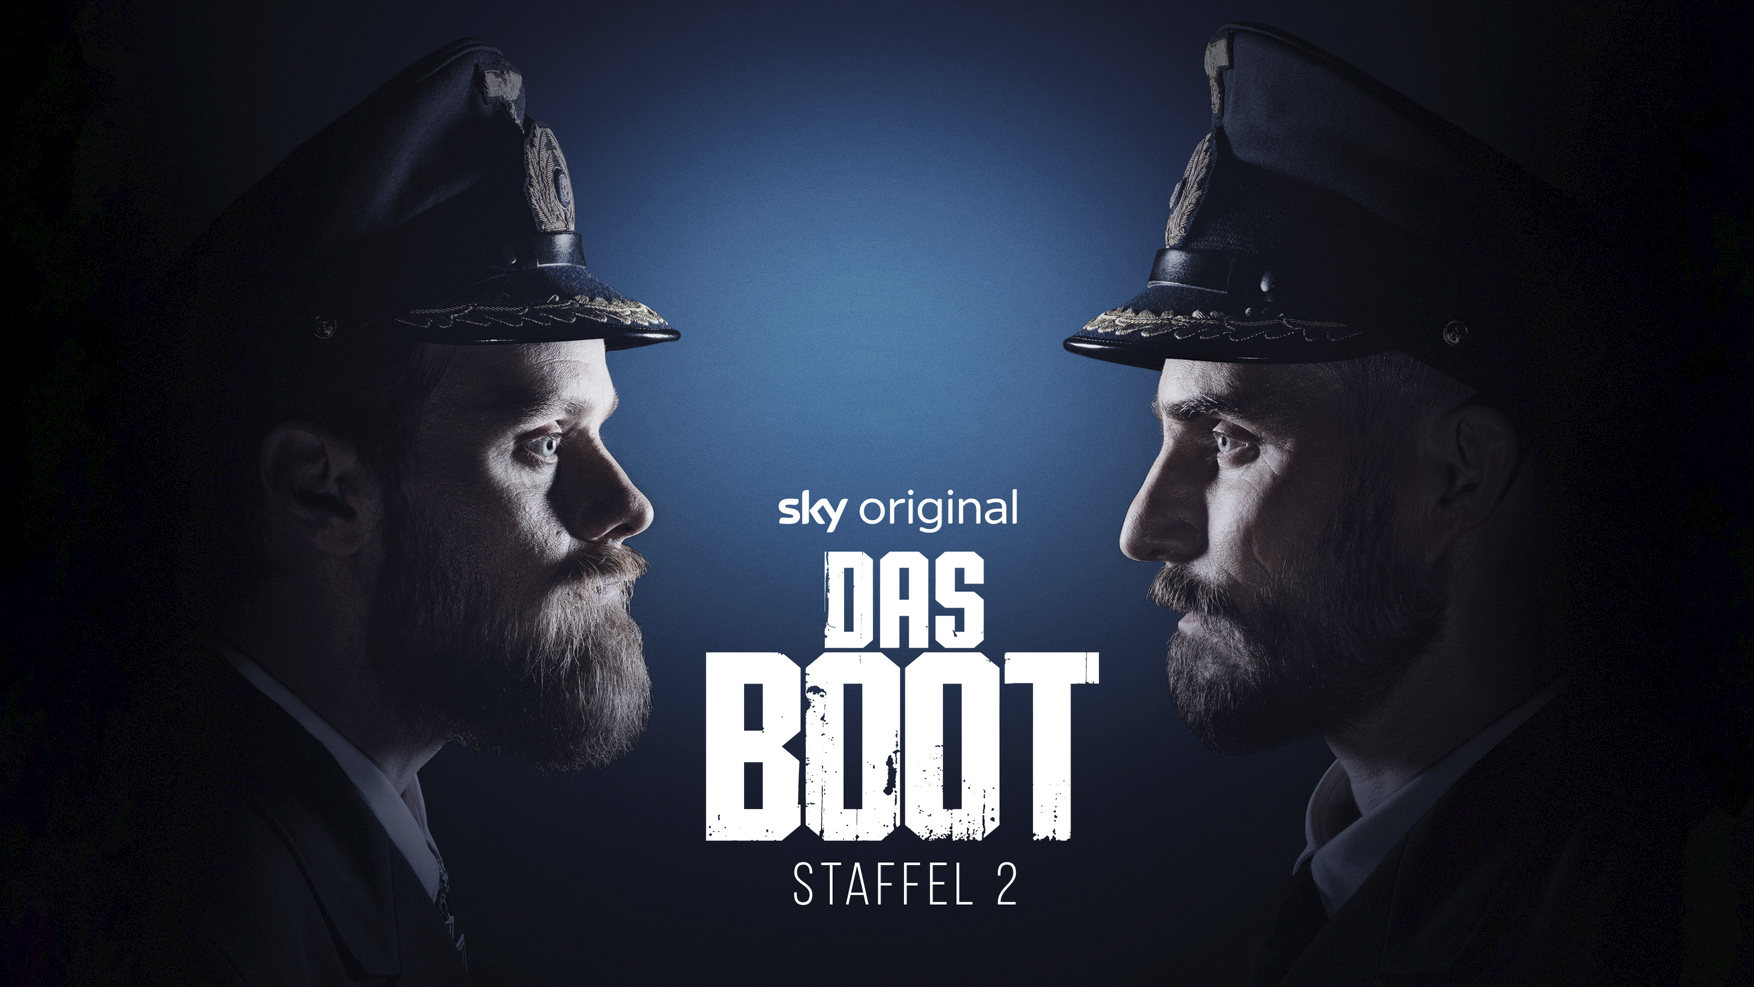 Falk Serie Staffel 2